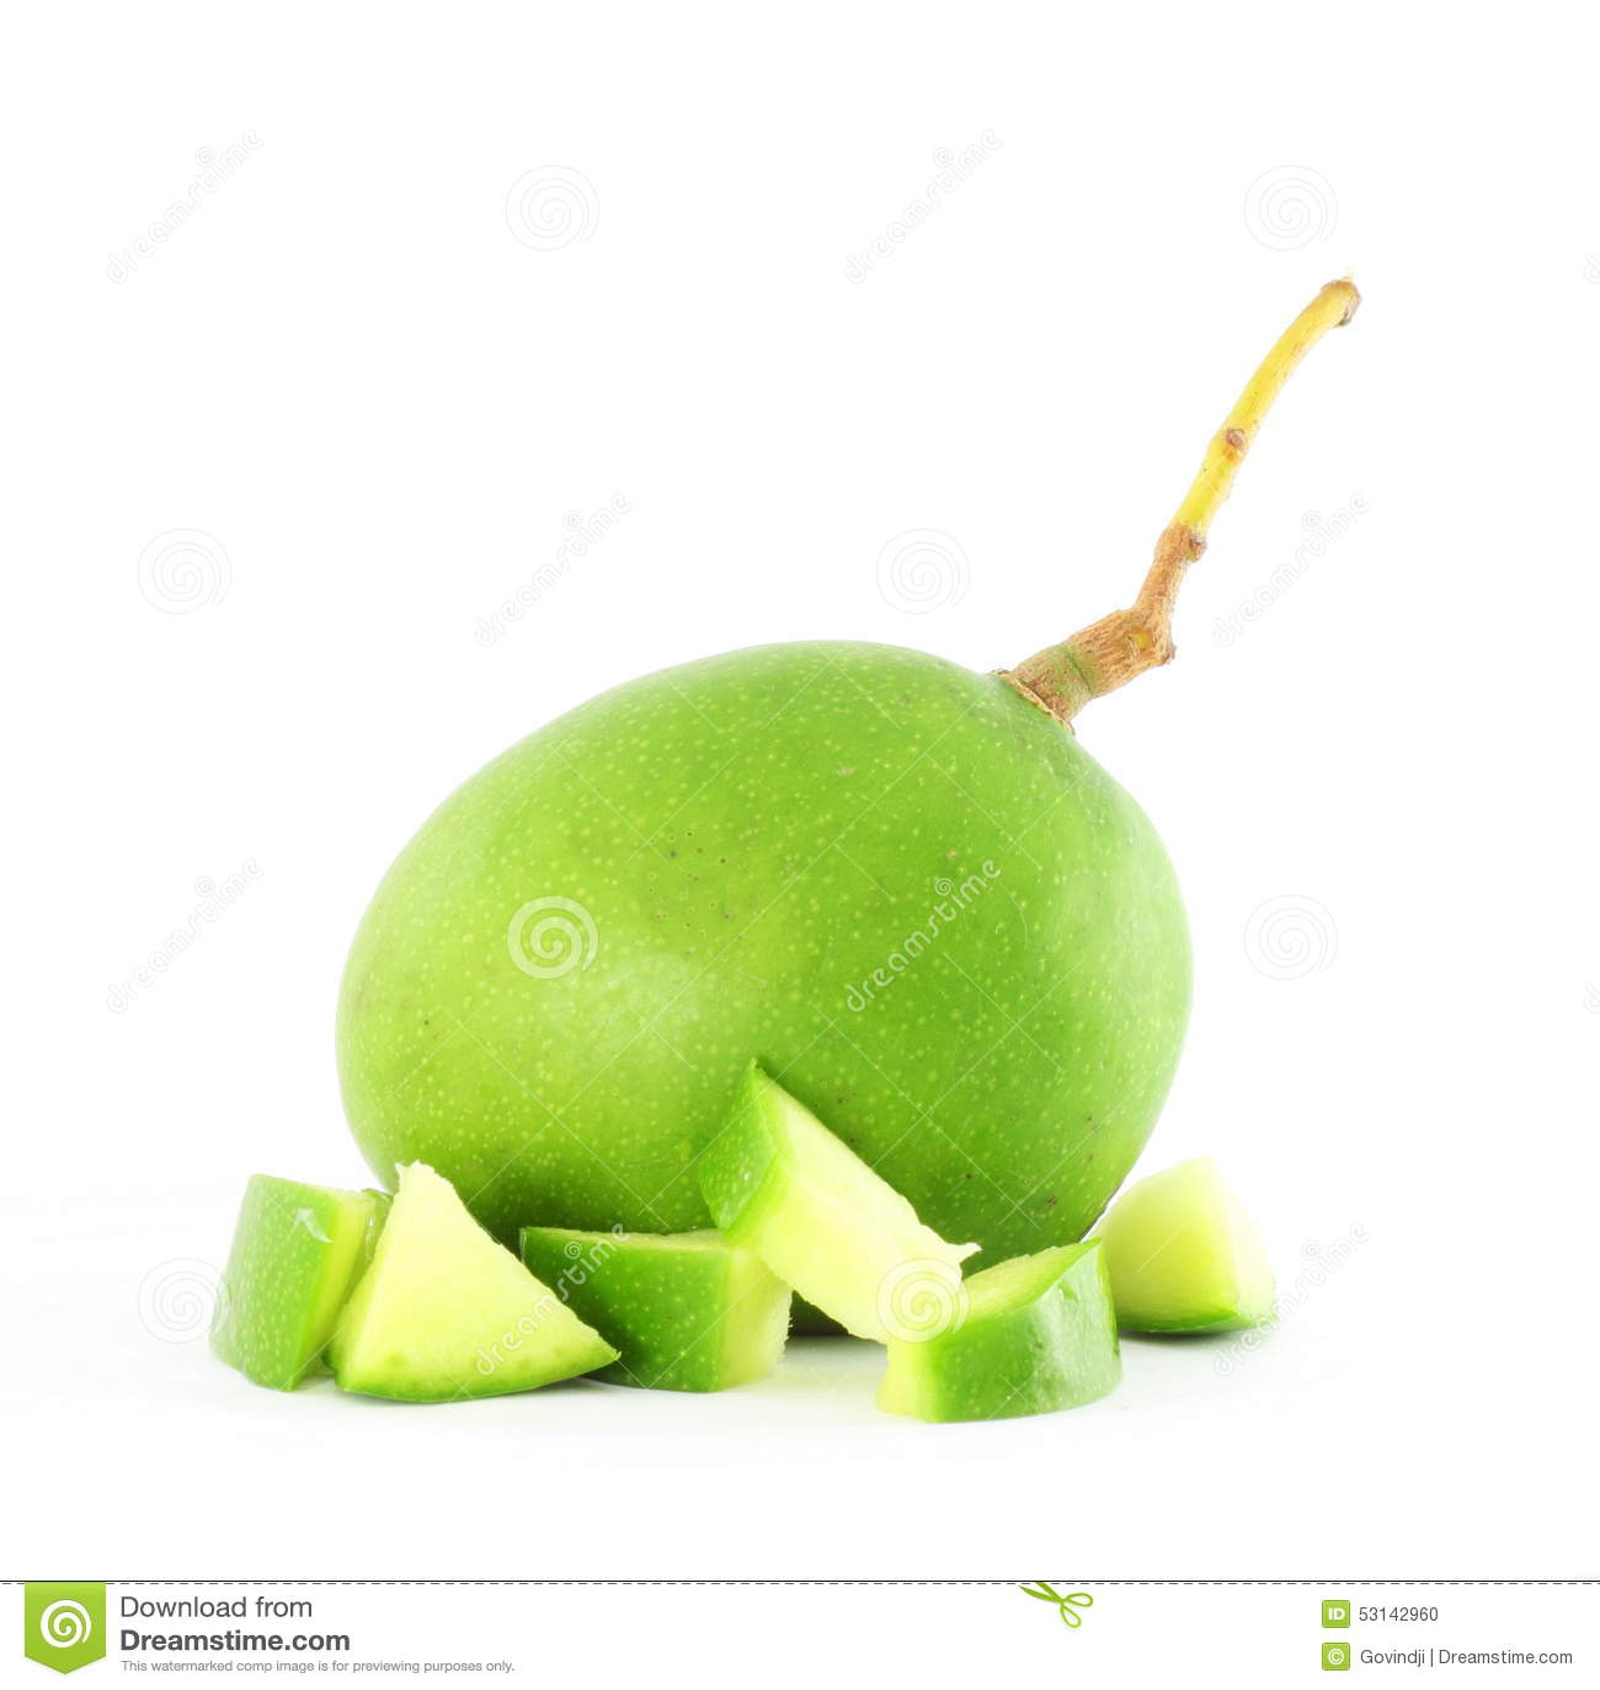 green mango with cut mango stock photo image 53142960